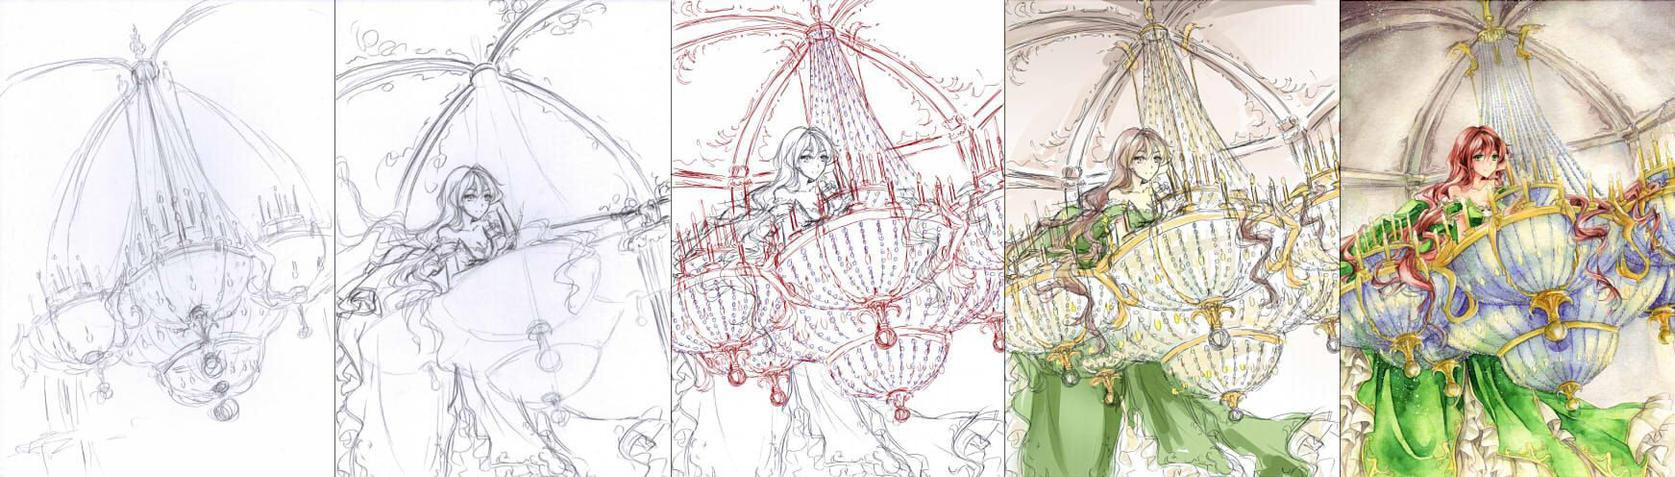 Baroness of Light_Progress by Kite-d